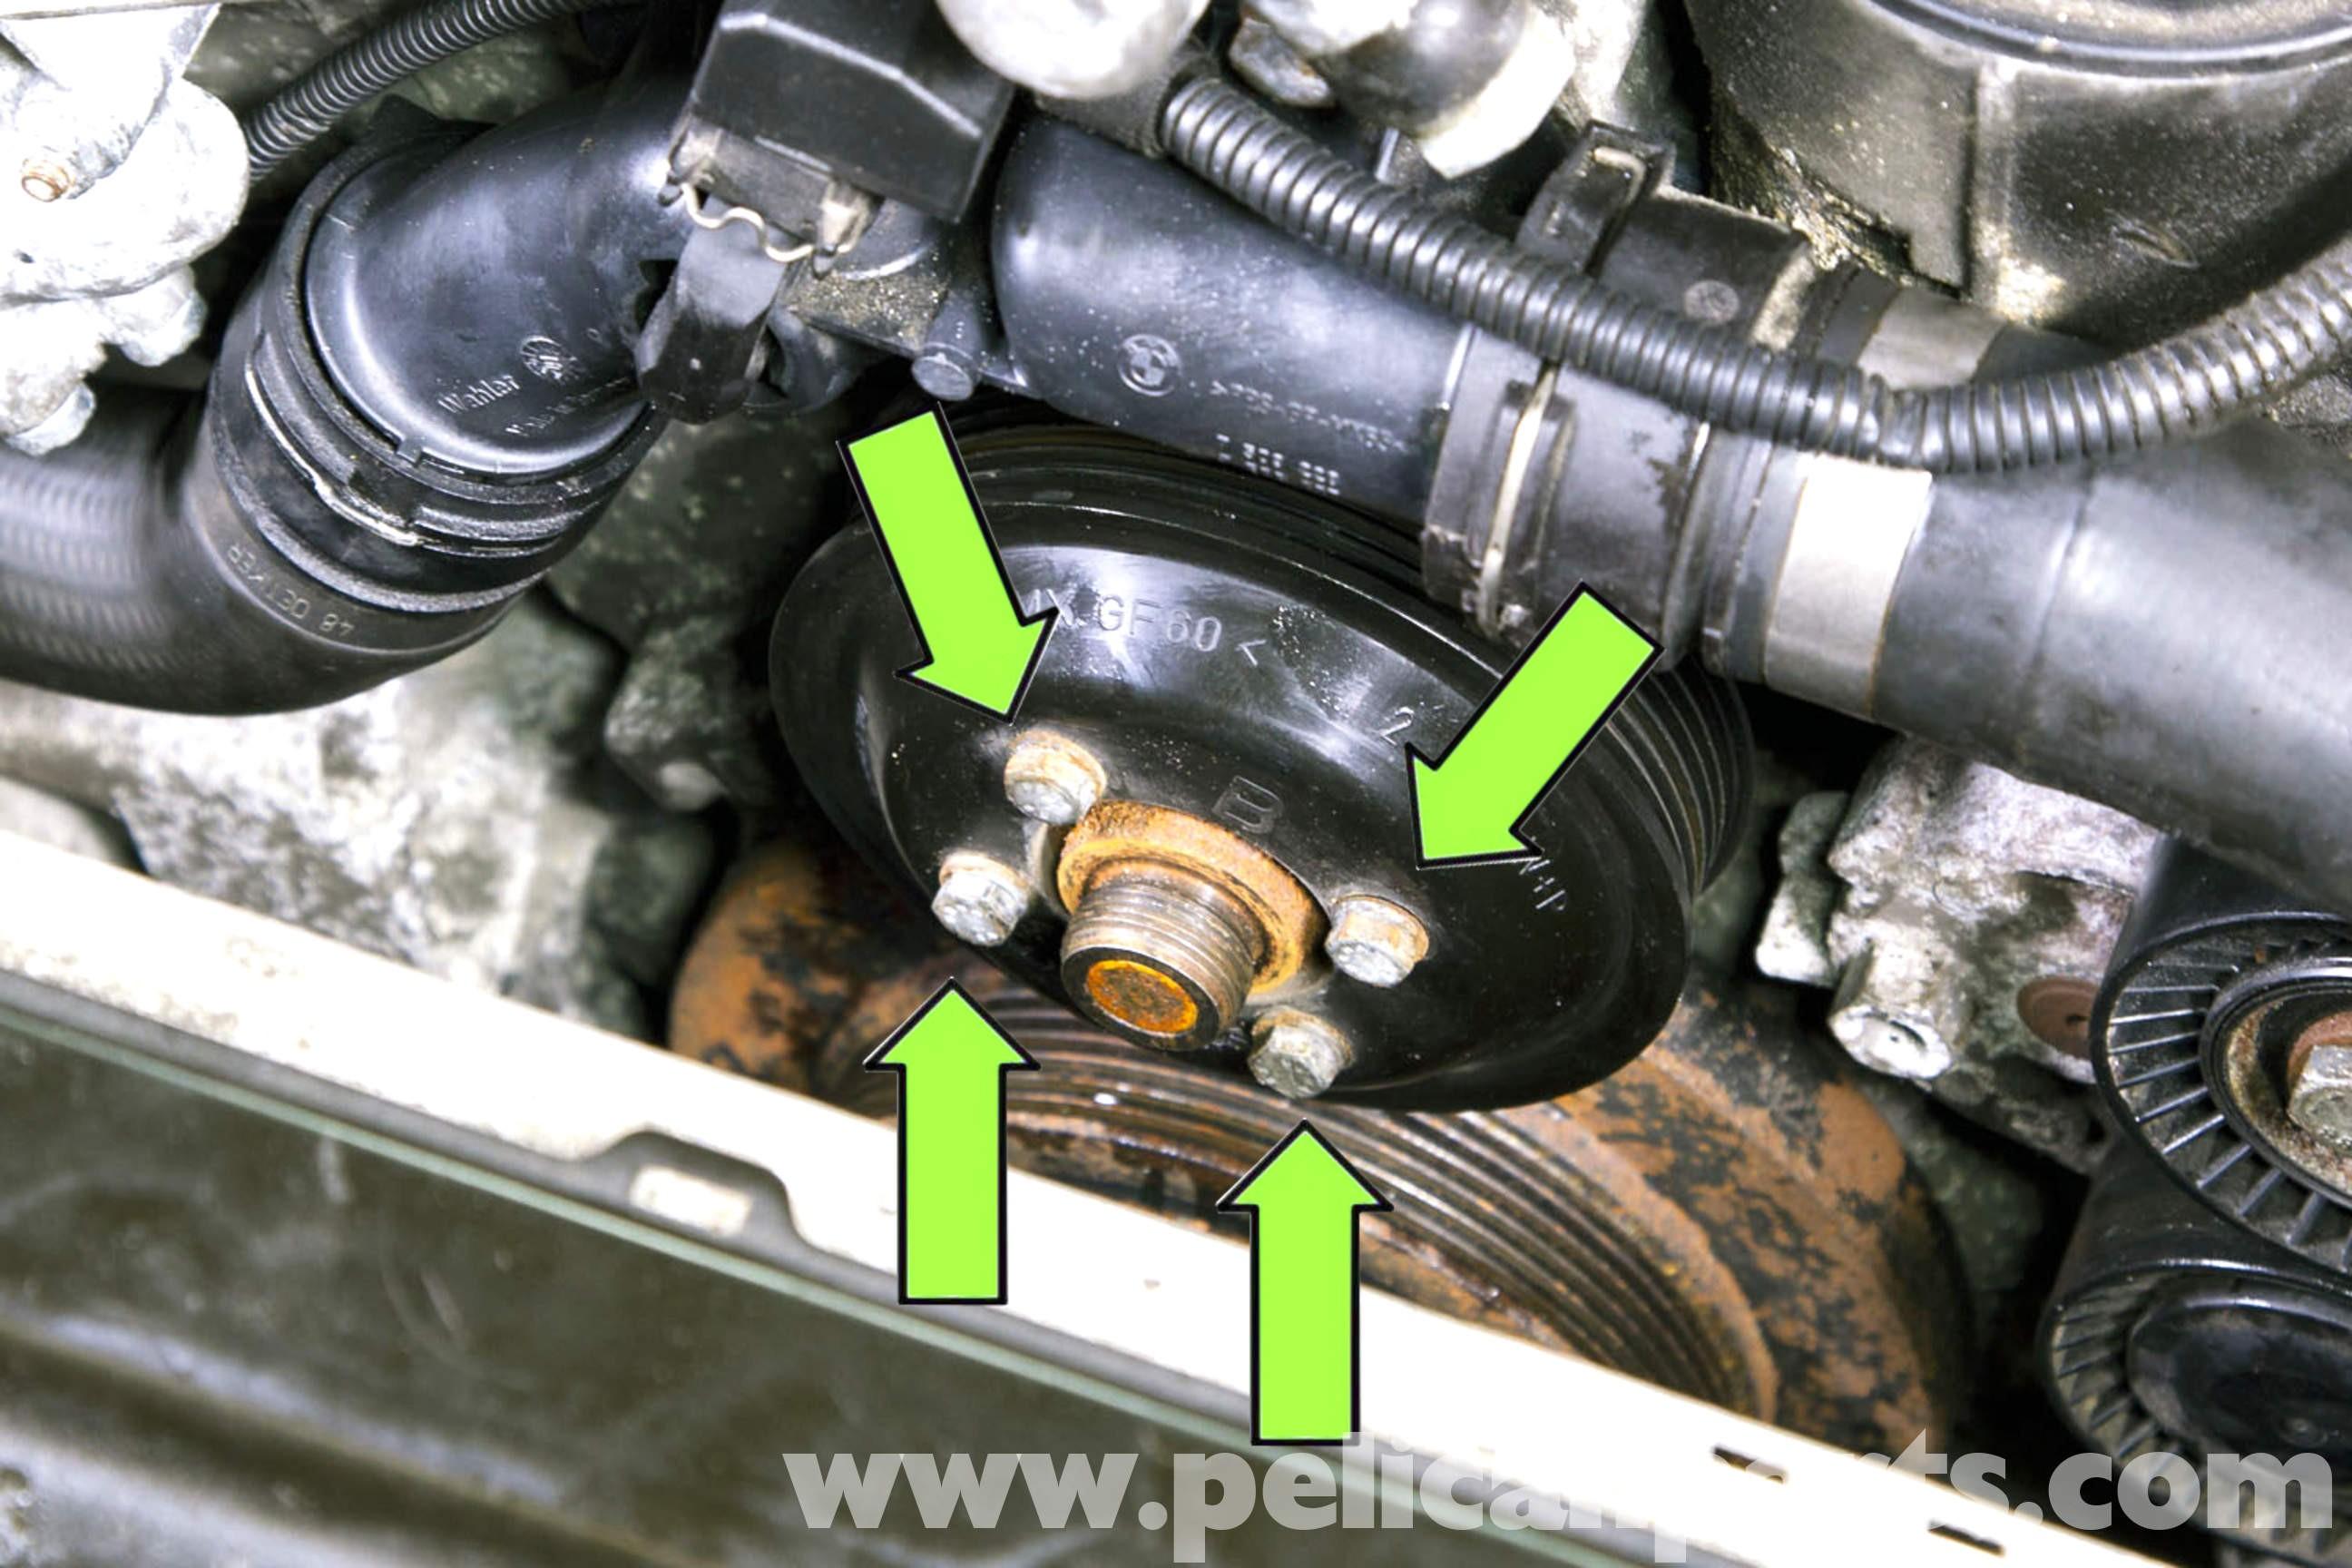 Bmw 318ti Engine Diagram Bmw E46 Water Pump Replacement Of Bmw 318ti Engine Diagram